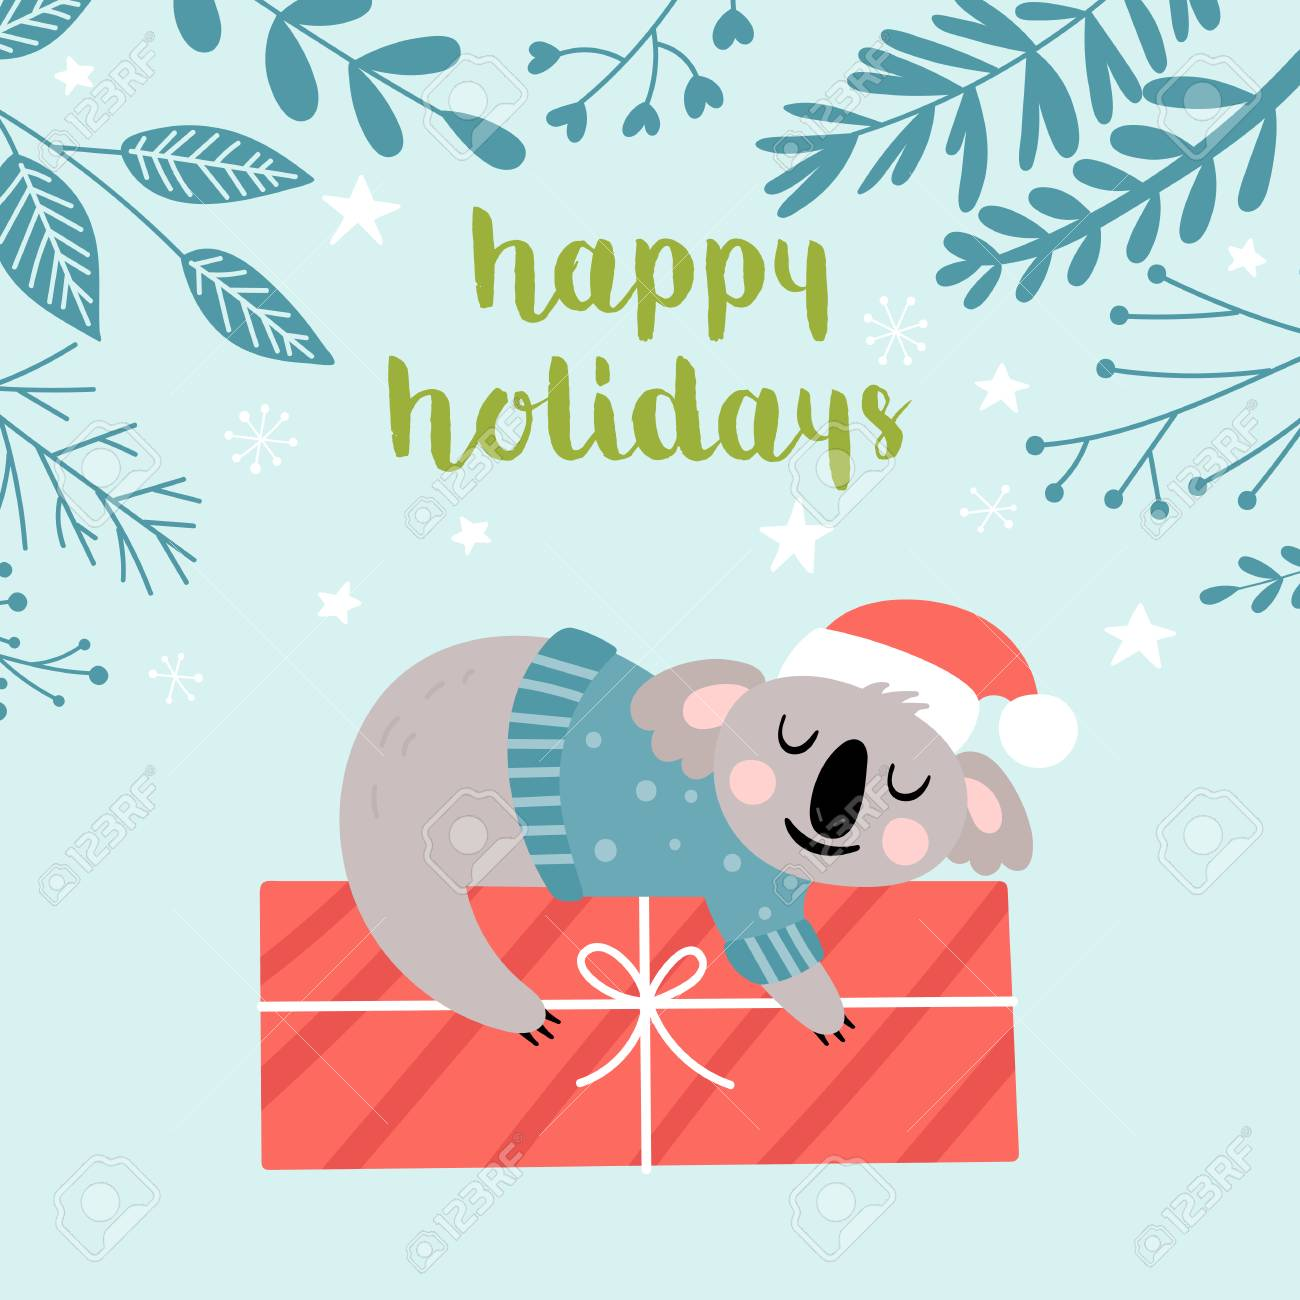 Christmas Cards To Print.Cute Koala Character Christmas Card Childish Print For T Shirt